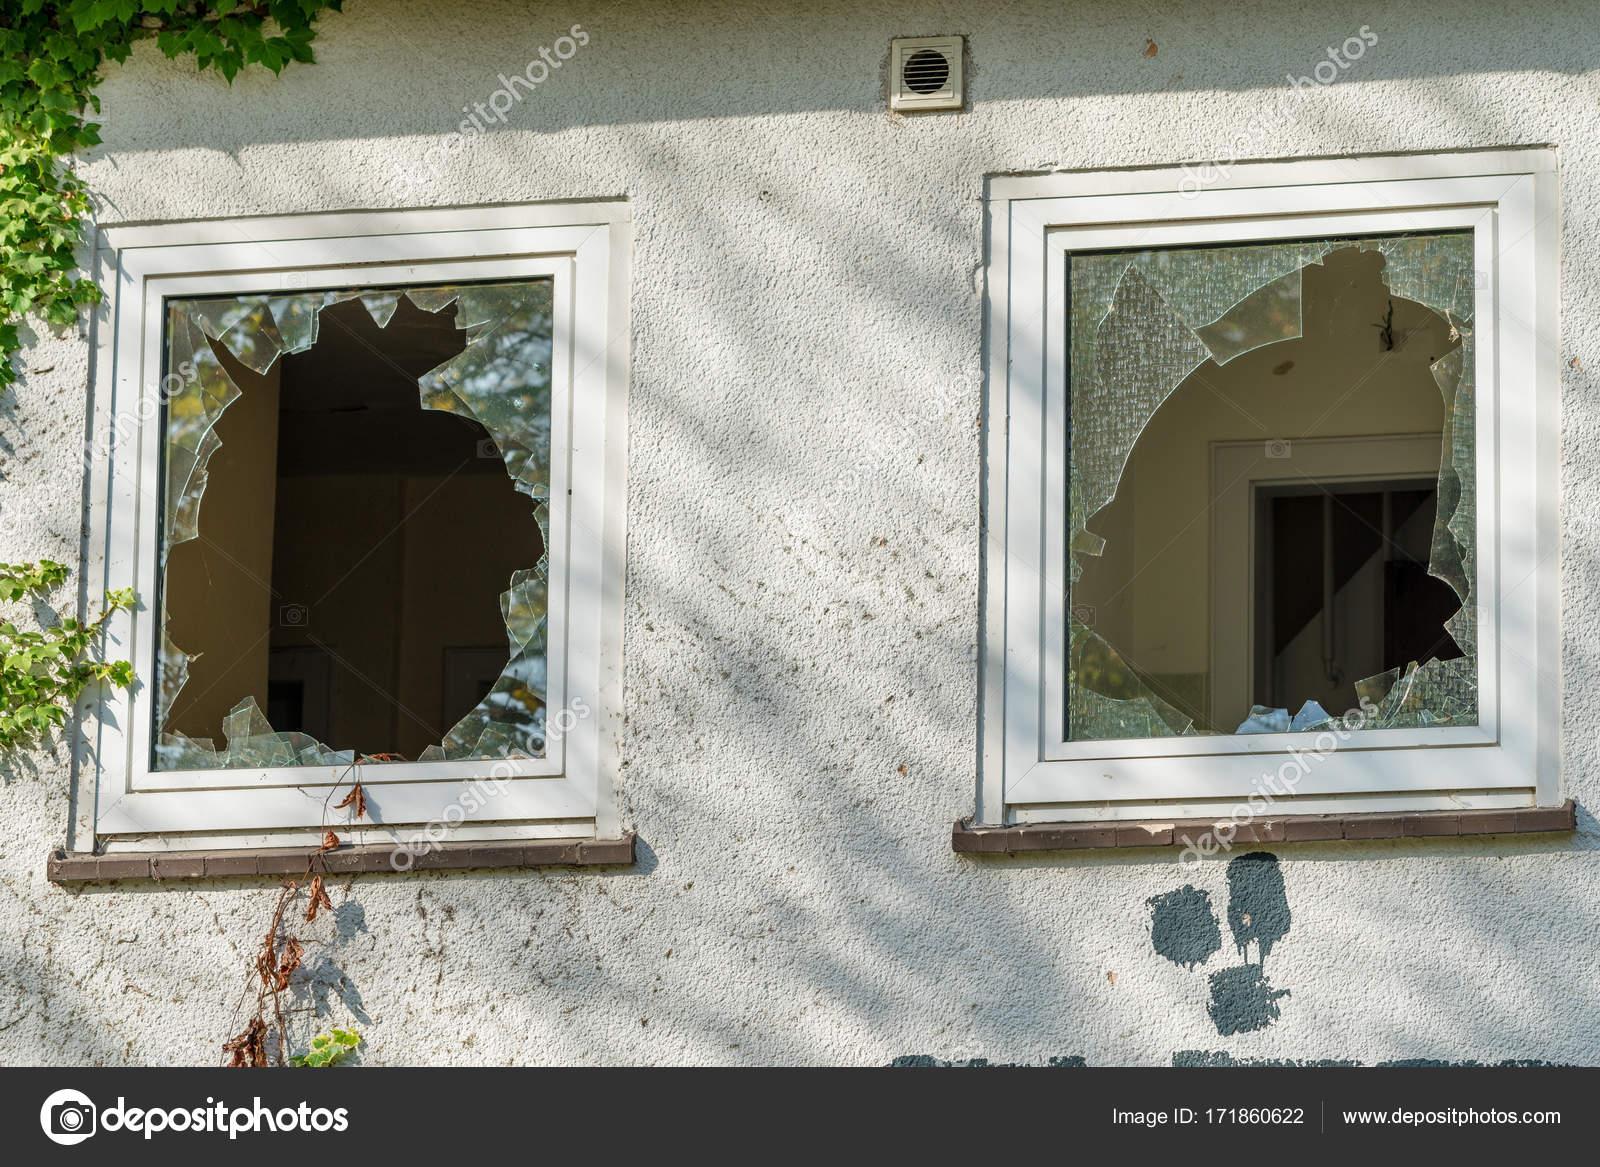 Brilliant Broken Window In The House Stock Photo C Ewastudio 171860622 Download Free Architecture Designs Itiscsunscenecom